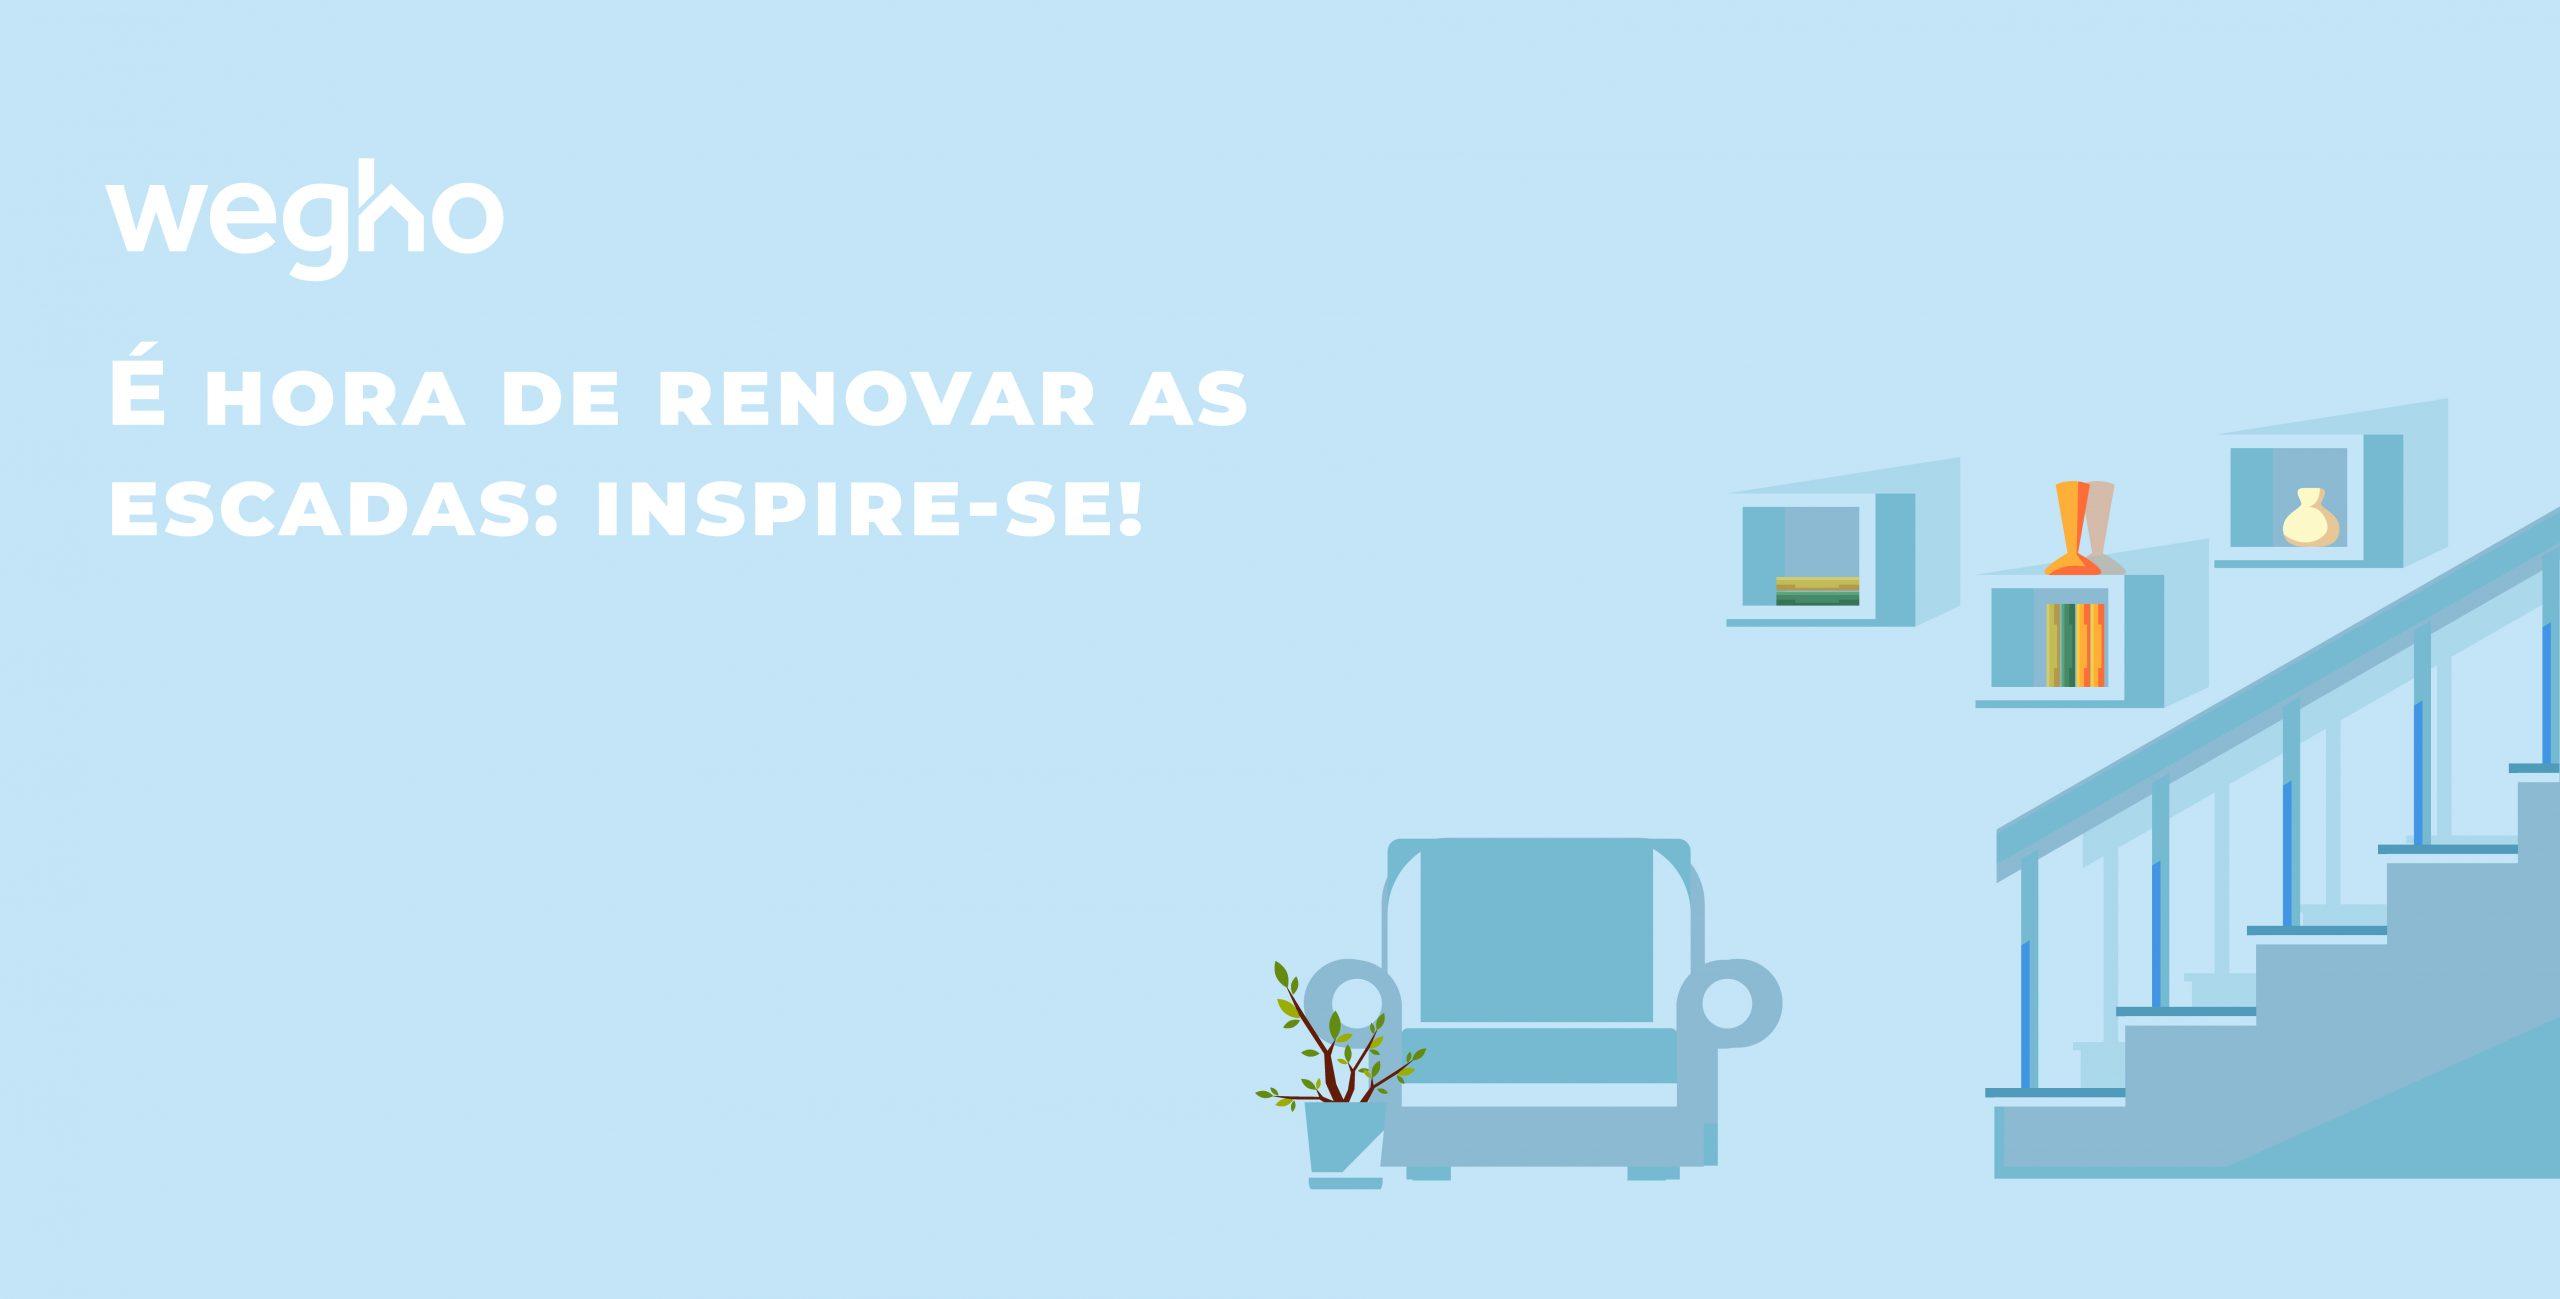 É hora de renovar as escadas: inspire-se!